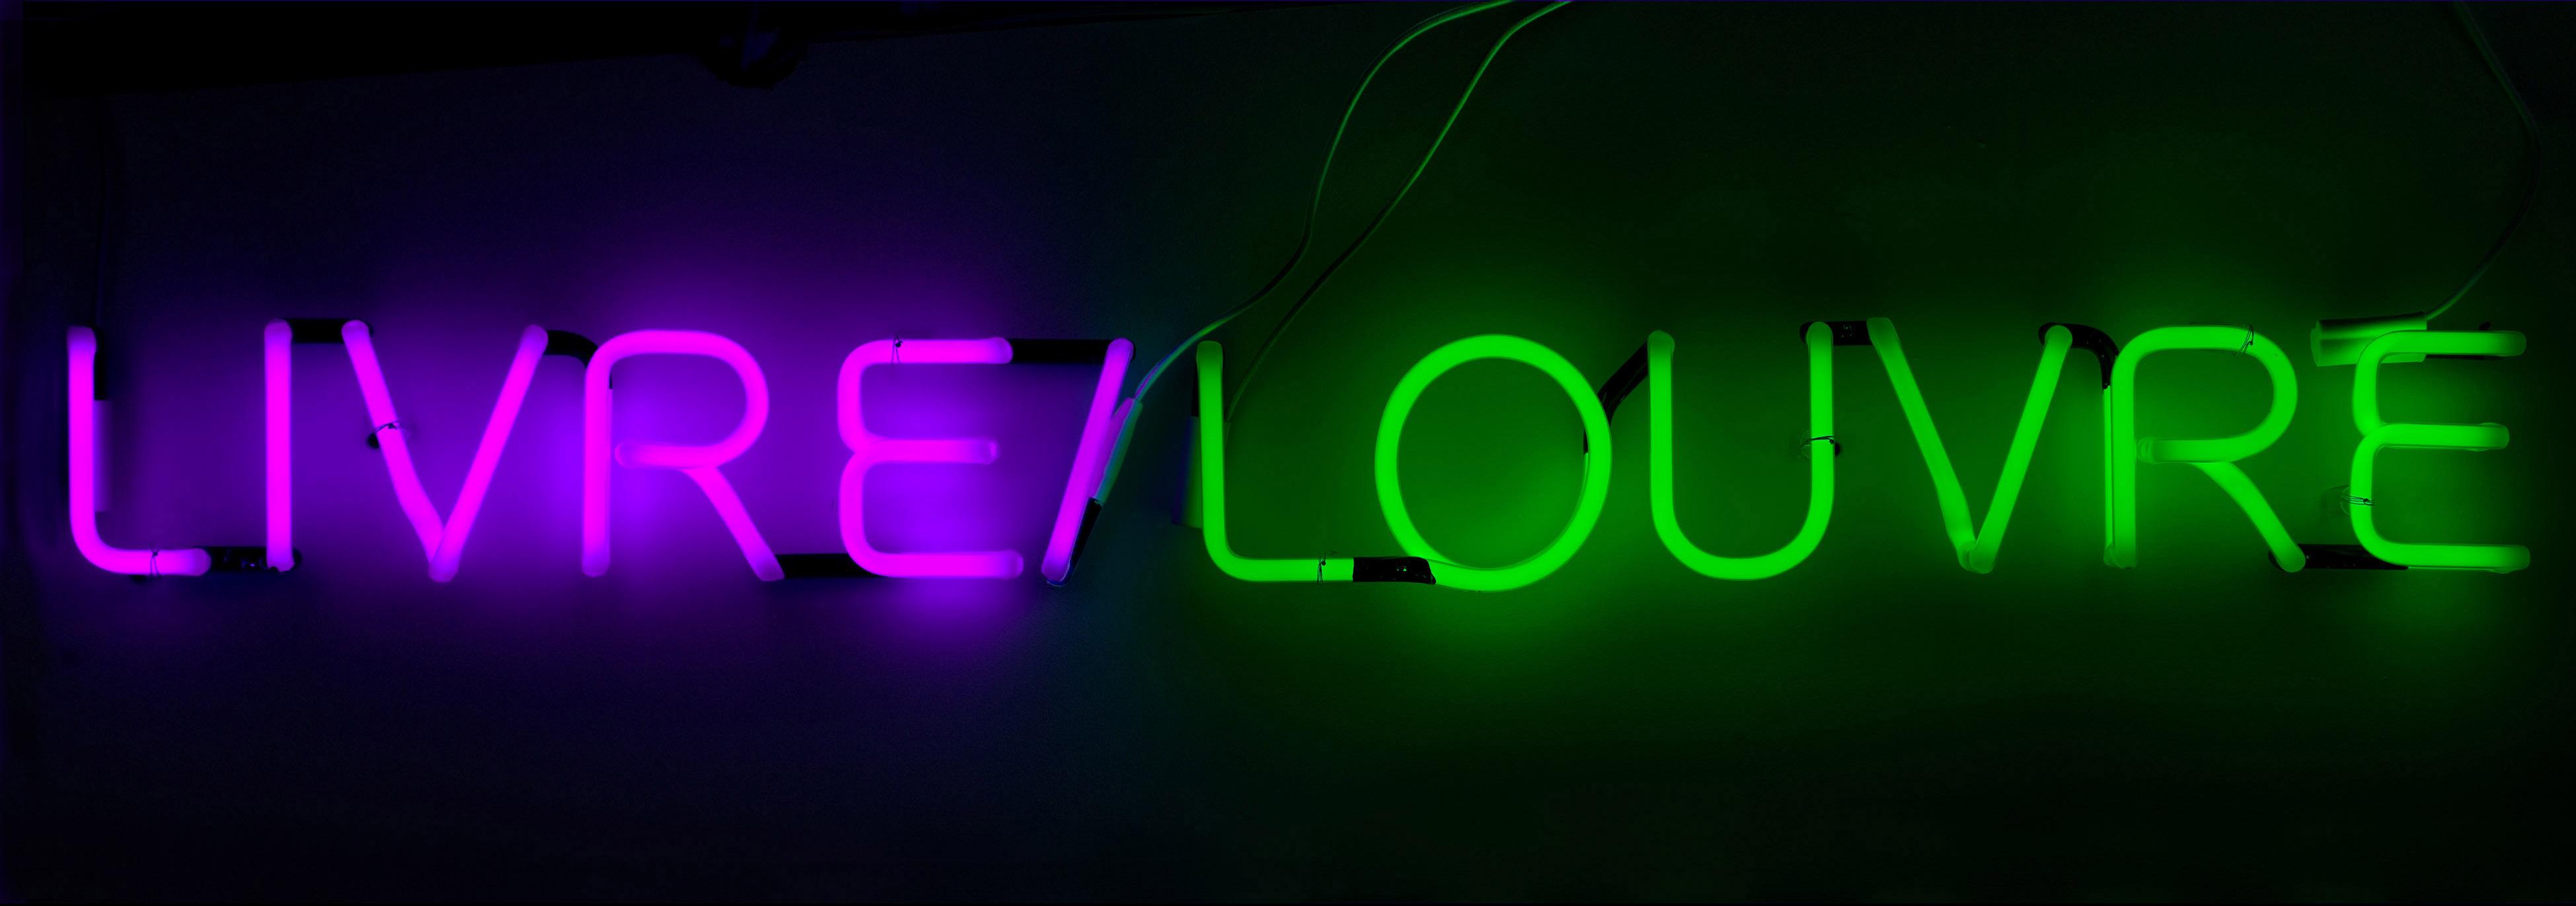 1-neon-livre-louvre